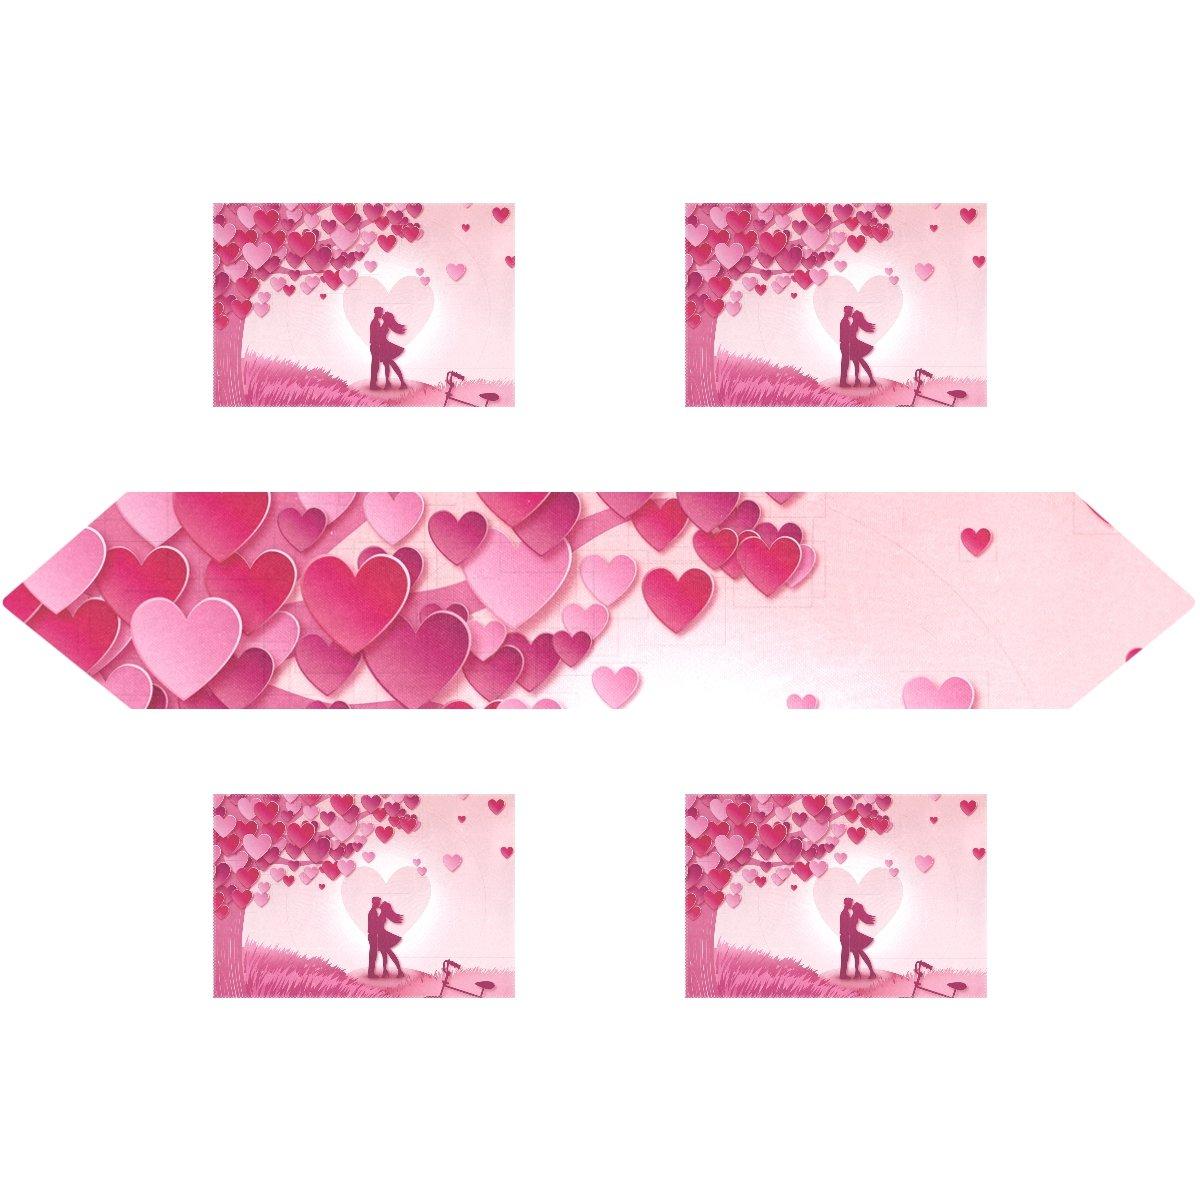 Happy Valentine 's Day長方形テーブルランナー13 x 70インチwithプレースマットテーブルマット12 x 18インチの4のセット、結婚式、パーティー、ディナー、夏&ピクニックの国アウトドアホーム装飾、 13x70(in) & 12x18x6(in) ホワイト g2463676p172c202s301 13x70(in) & 12x18x6(in)  B0792SY6FR